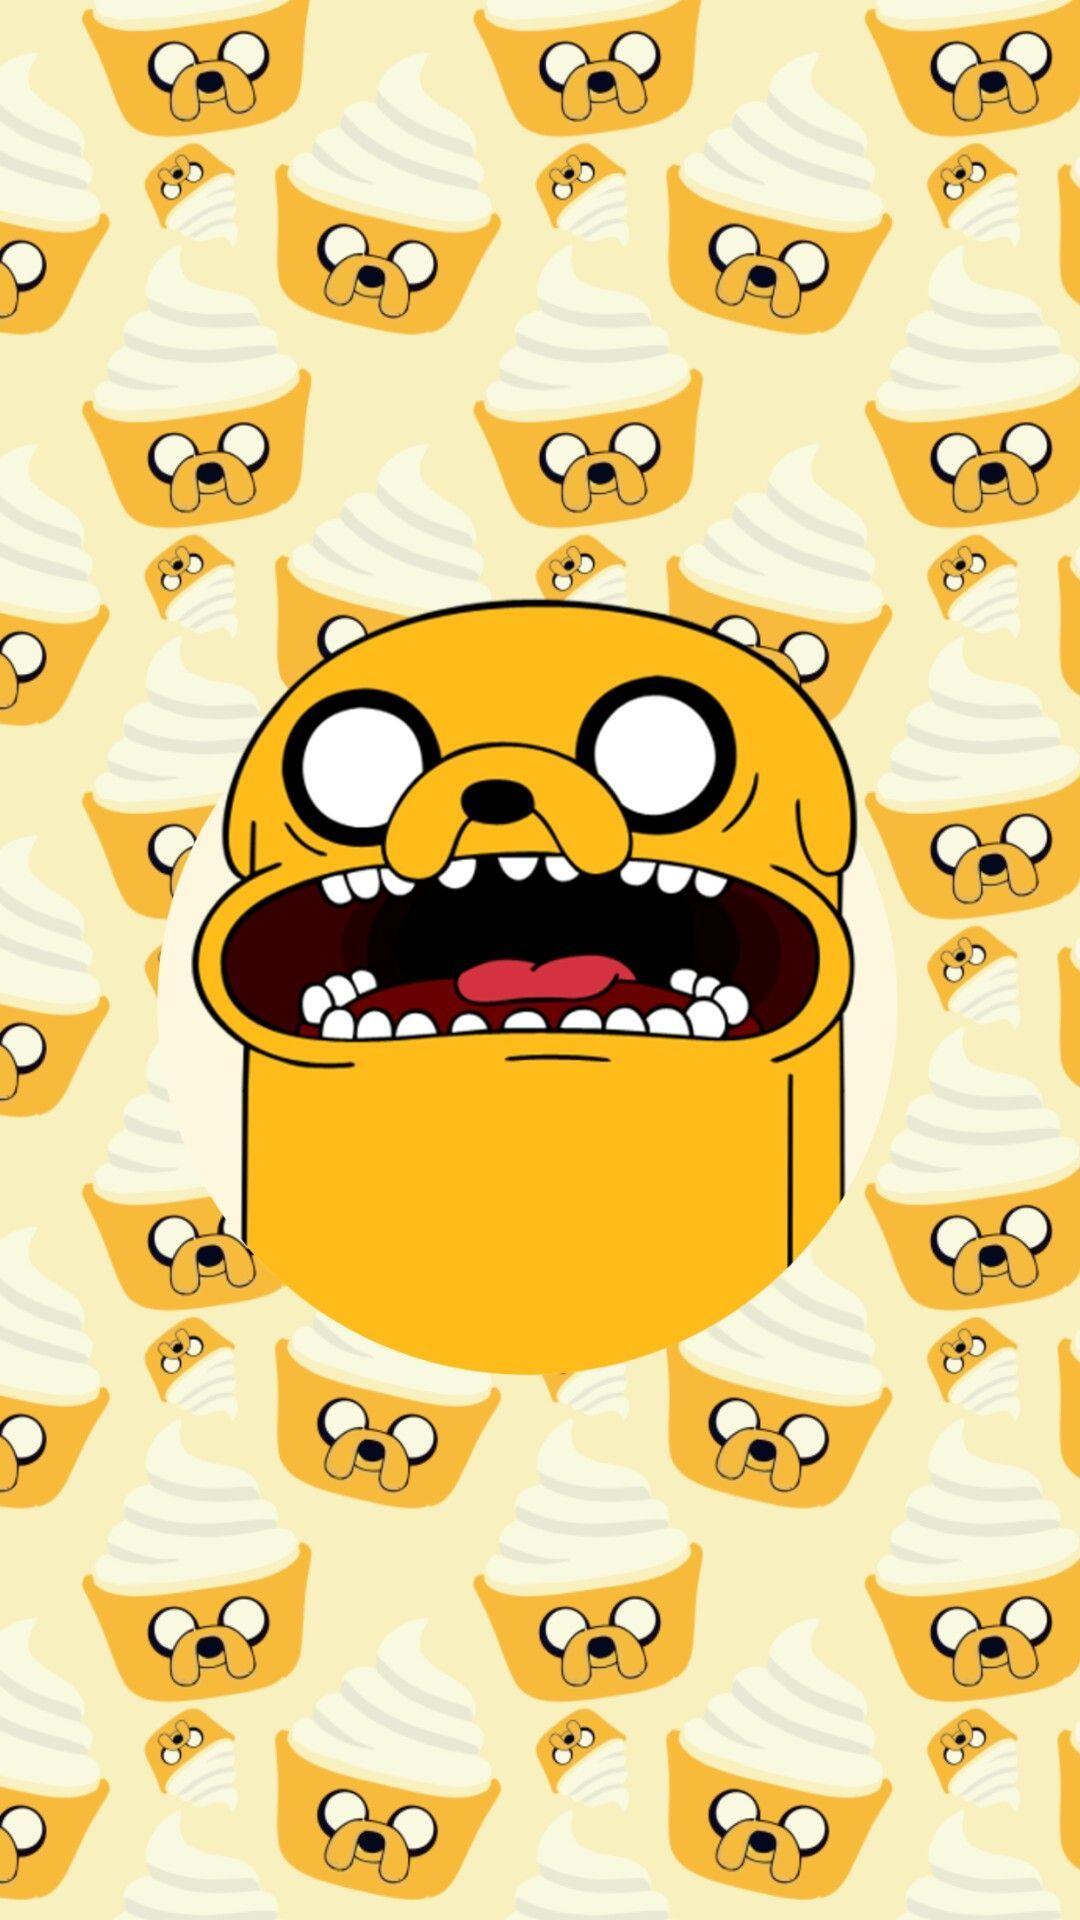 Aesthetic Adventure Time Wallpaper Hd ...